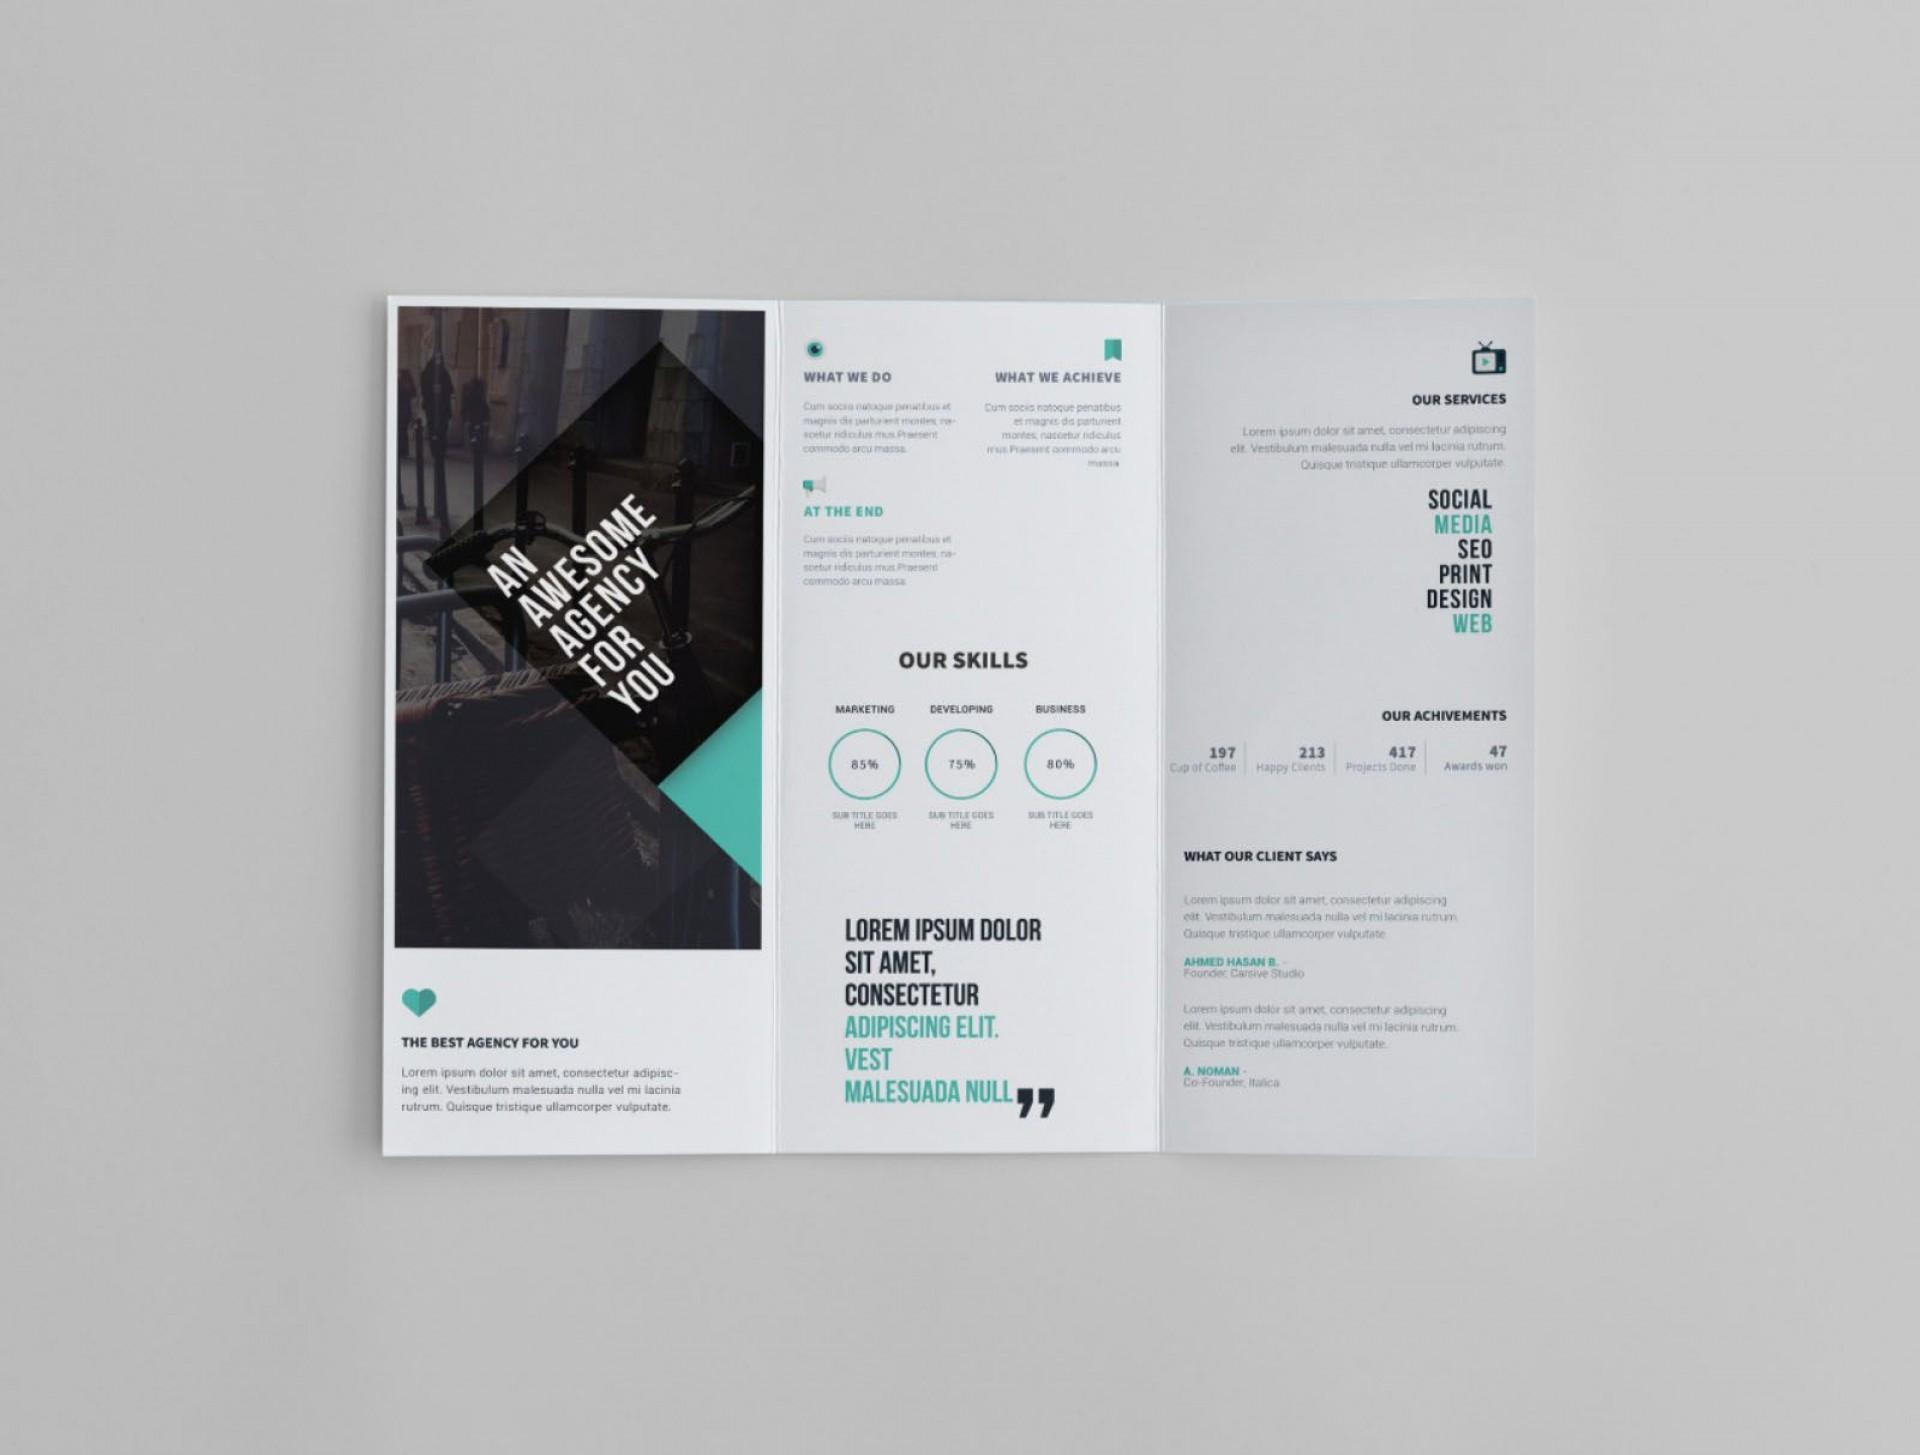 009 Exceptional Free Tri Fold Brochure Template Inspiration  Photoshop Illustrator Microsoft Word 20101920